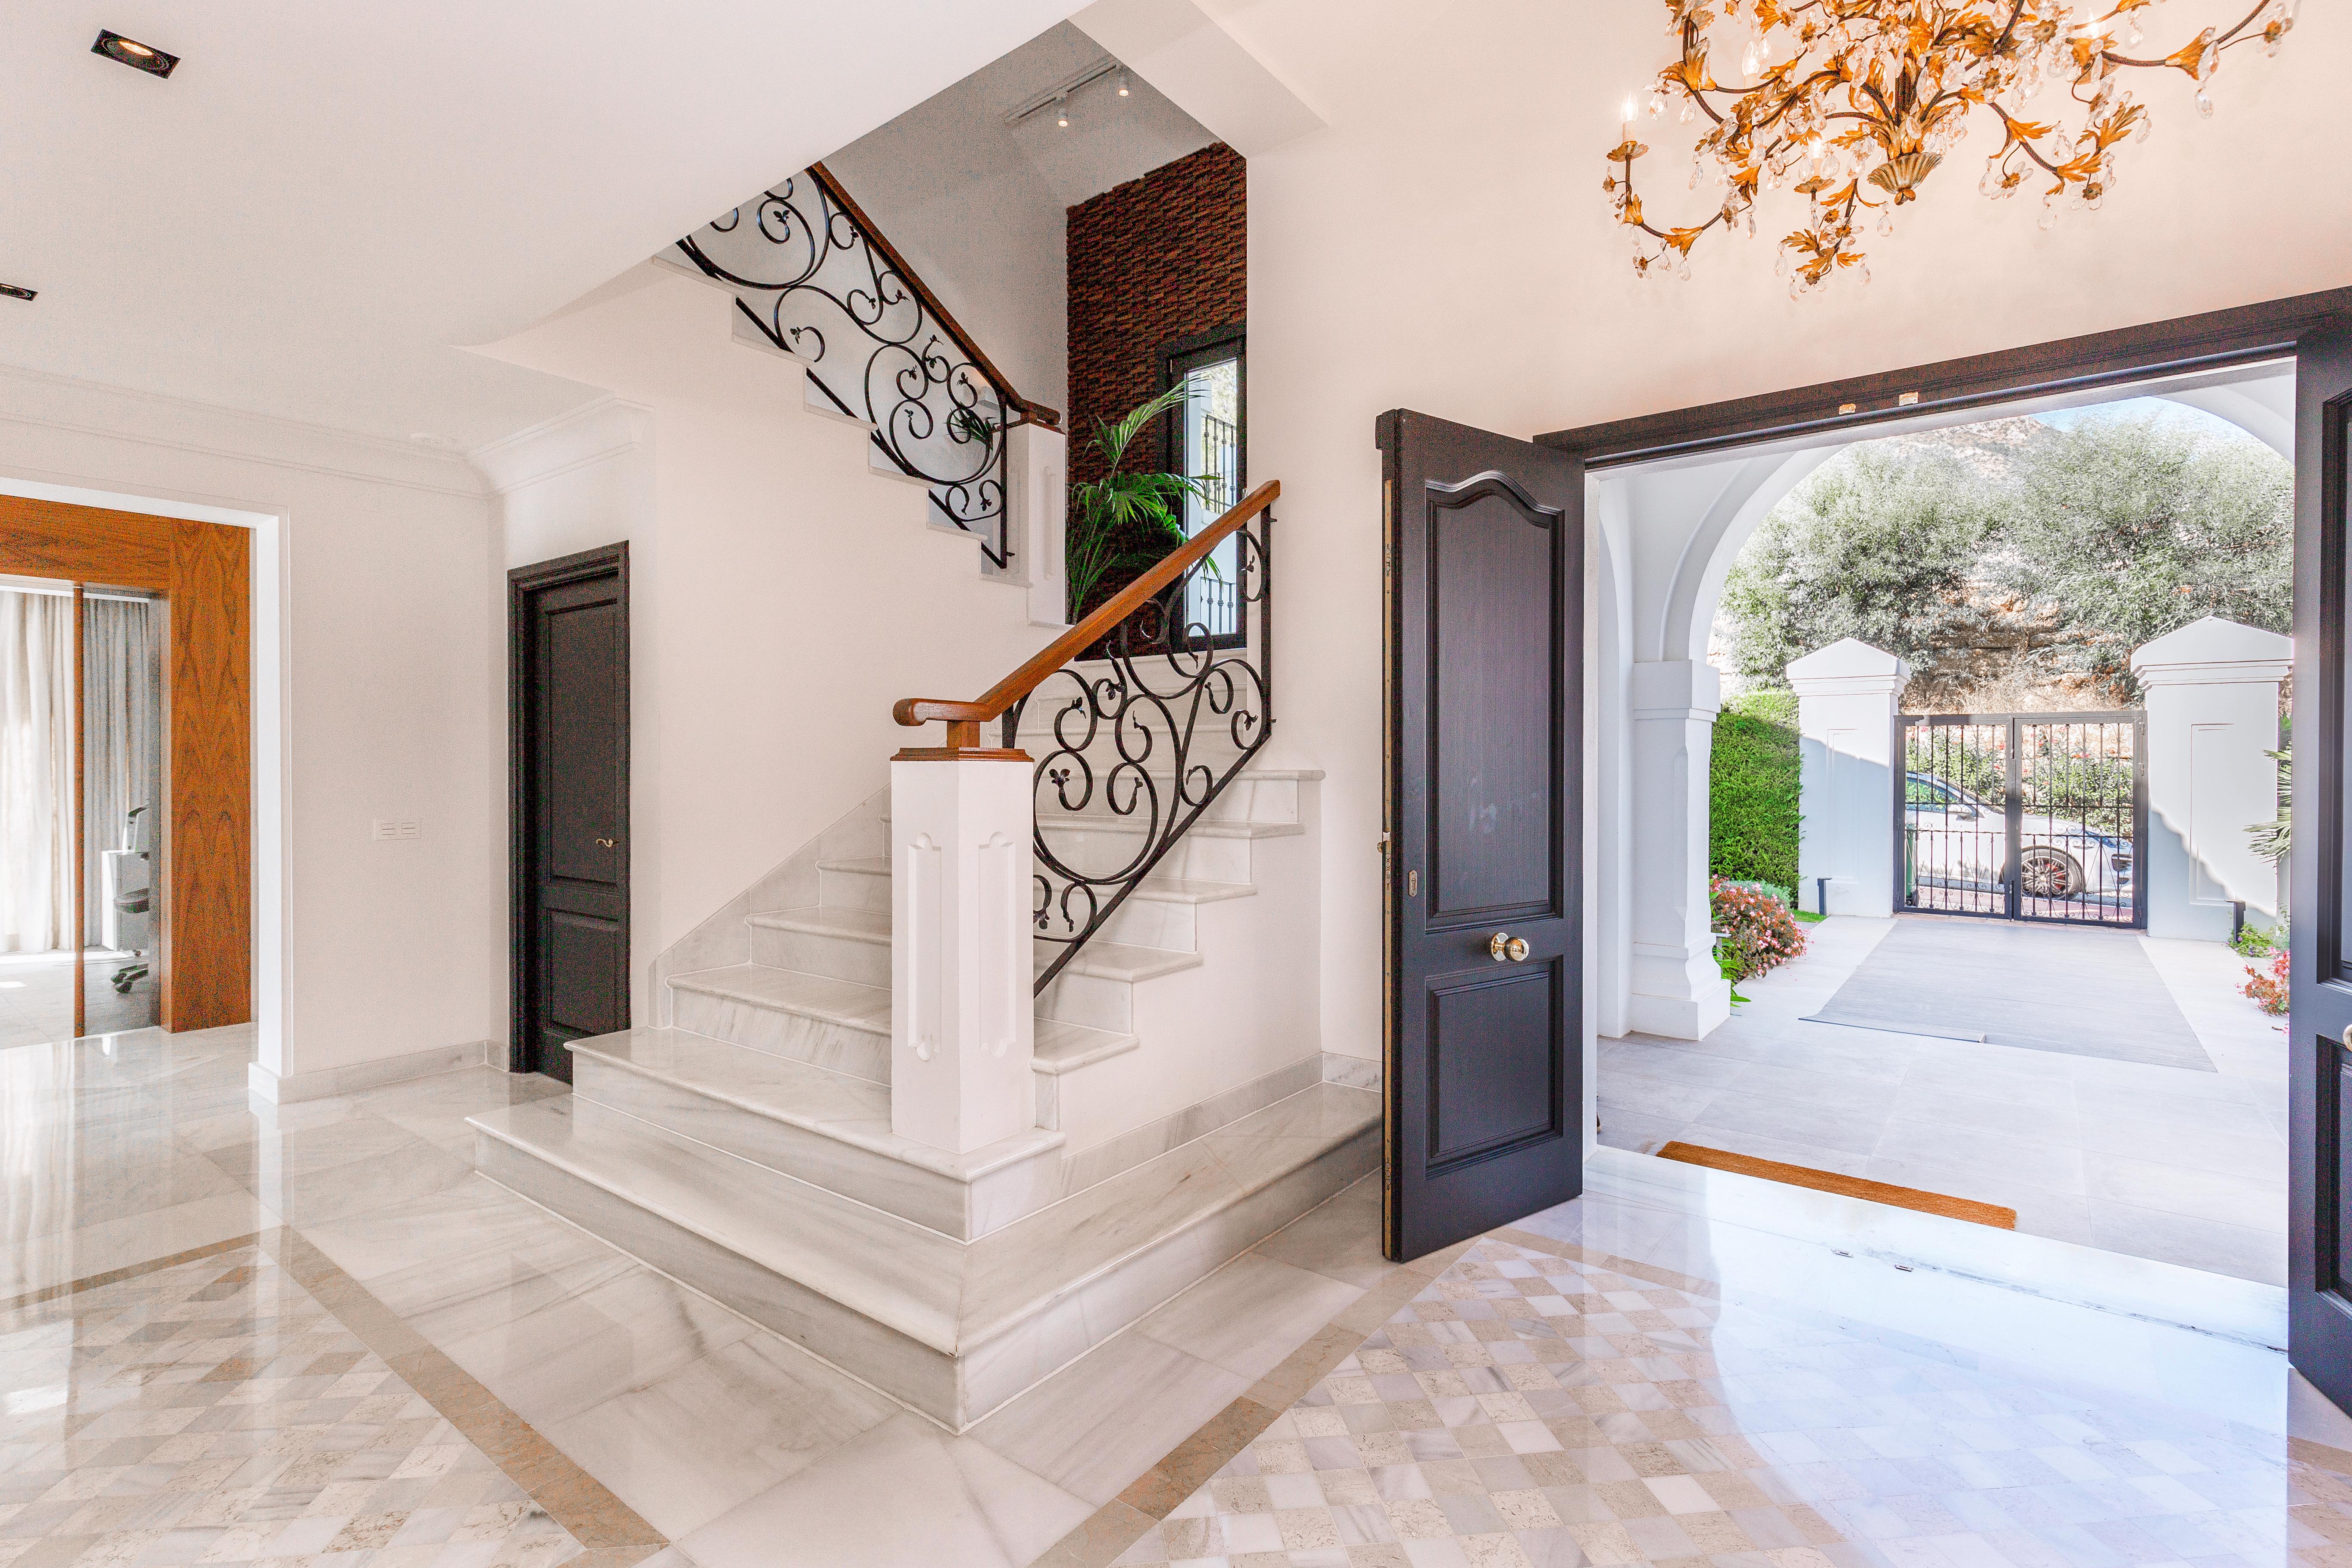 4 Bedroom Villa in Sierra Blanca